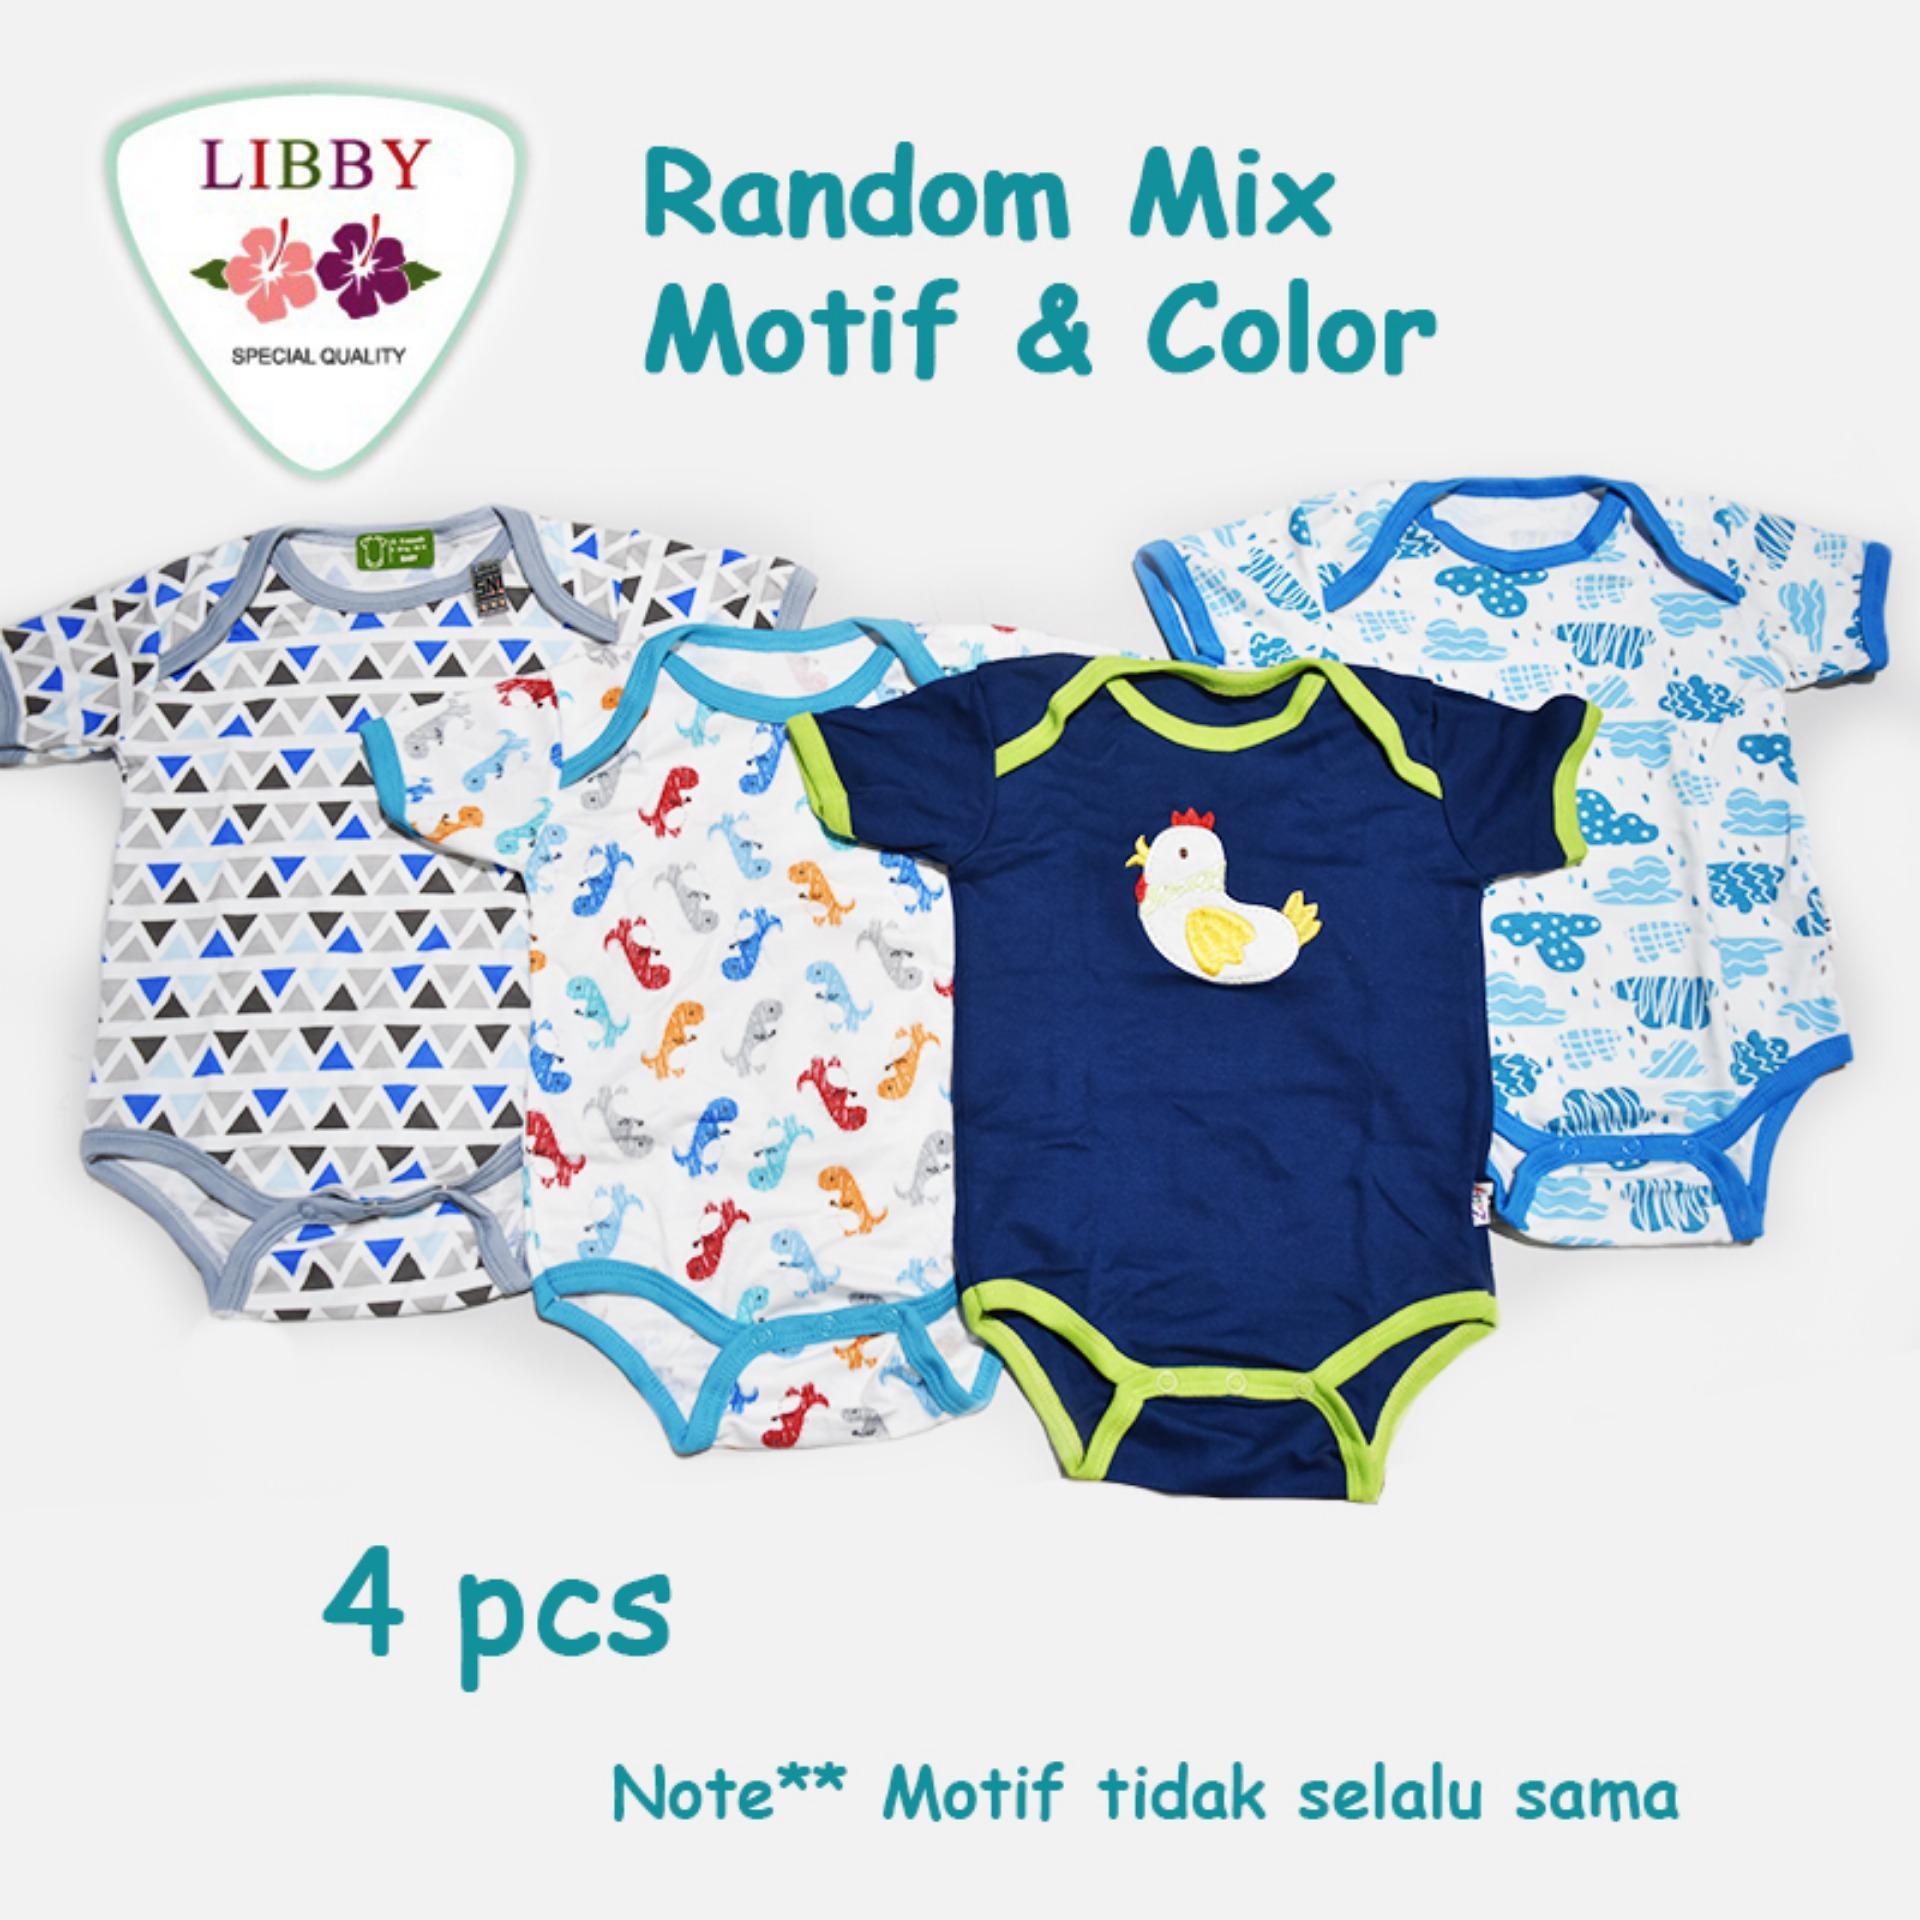 Miabelle Bodysuit Set 5 Buah Harper Spec Dan Daftar Harga Terbaru Bandana Bib 3pcs Fp02 Libby Premium Boy Jumper Segitiga Isi 4 Pcs 6 9 Months